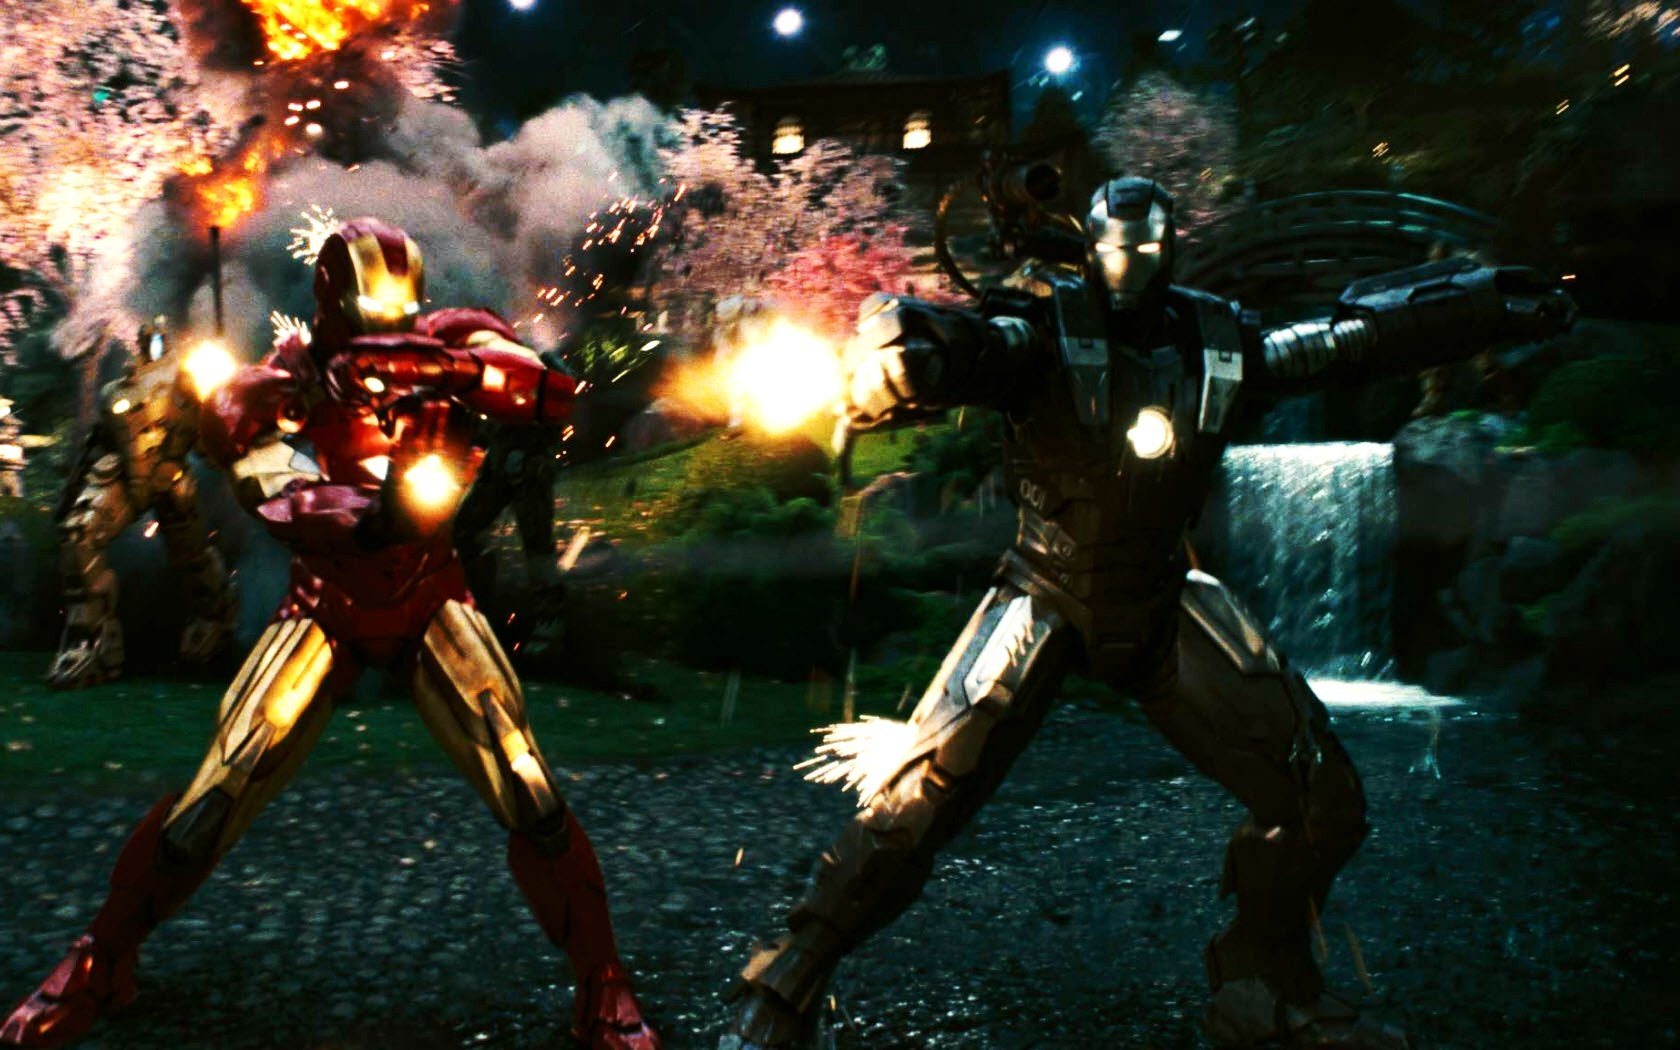 Iron Man 2 Last Scene Wallpapers HD Wallpapers 1680x1050